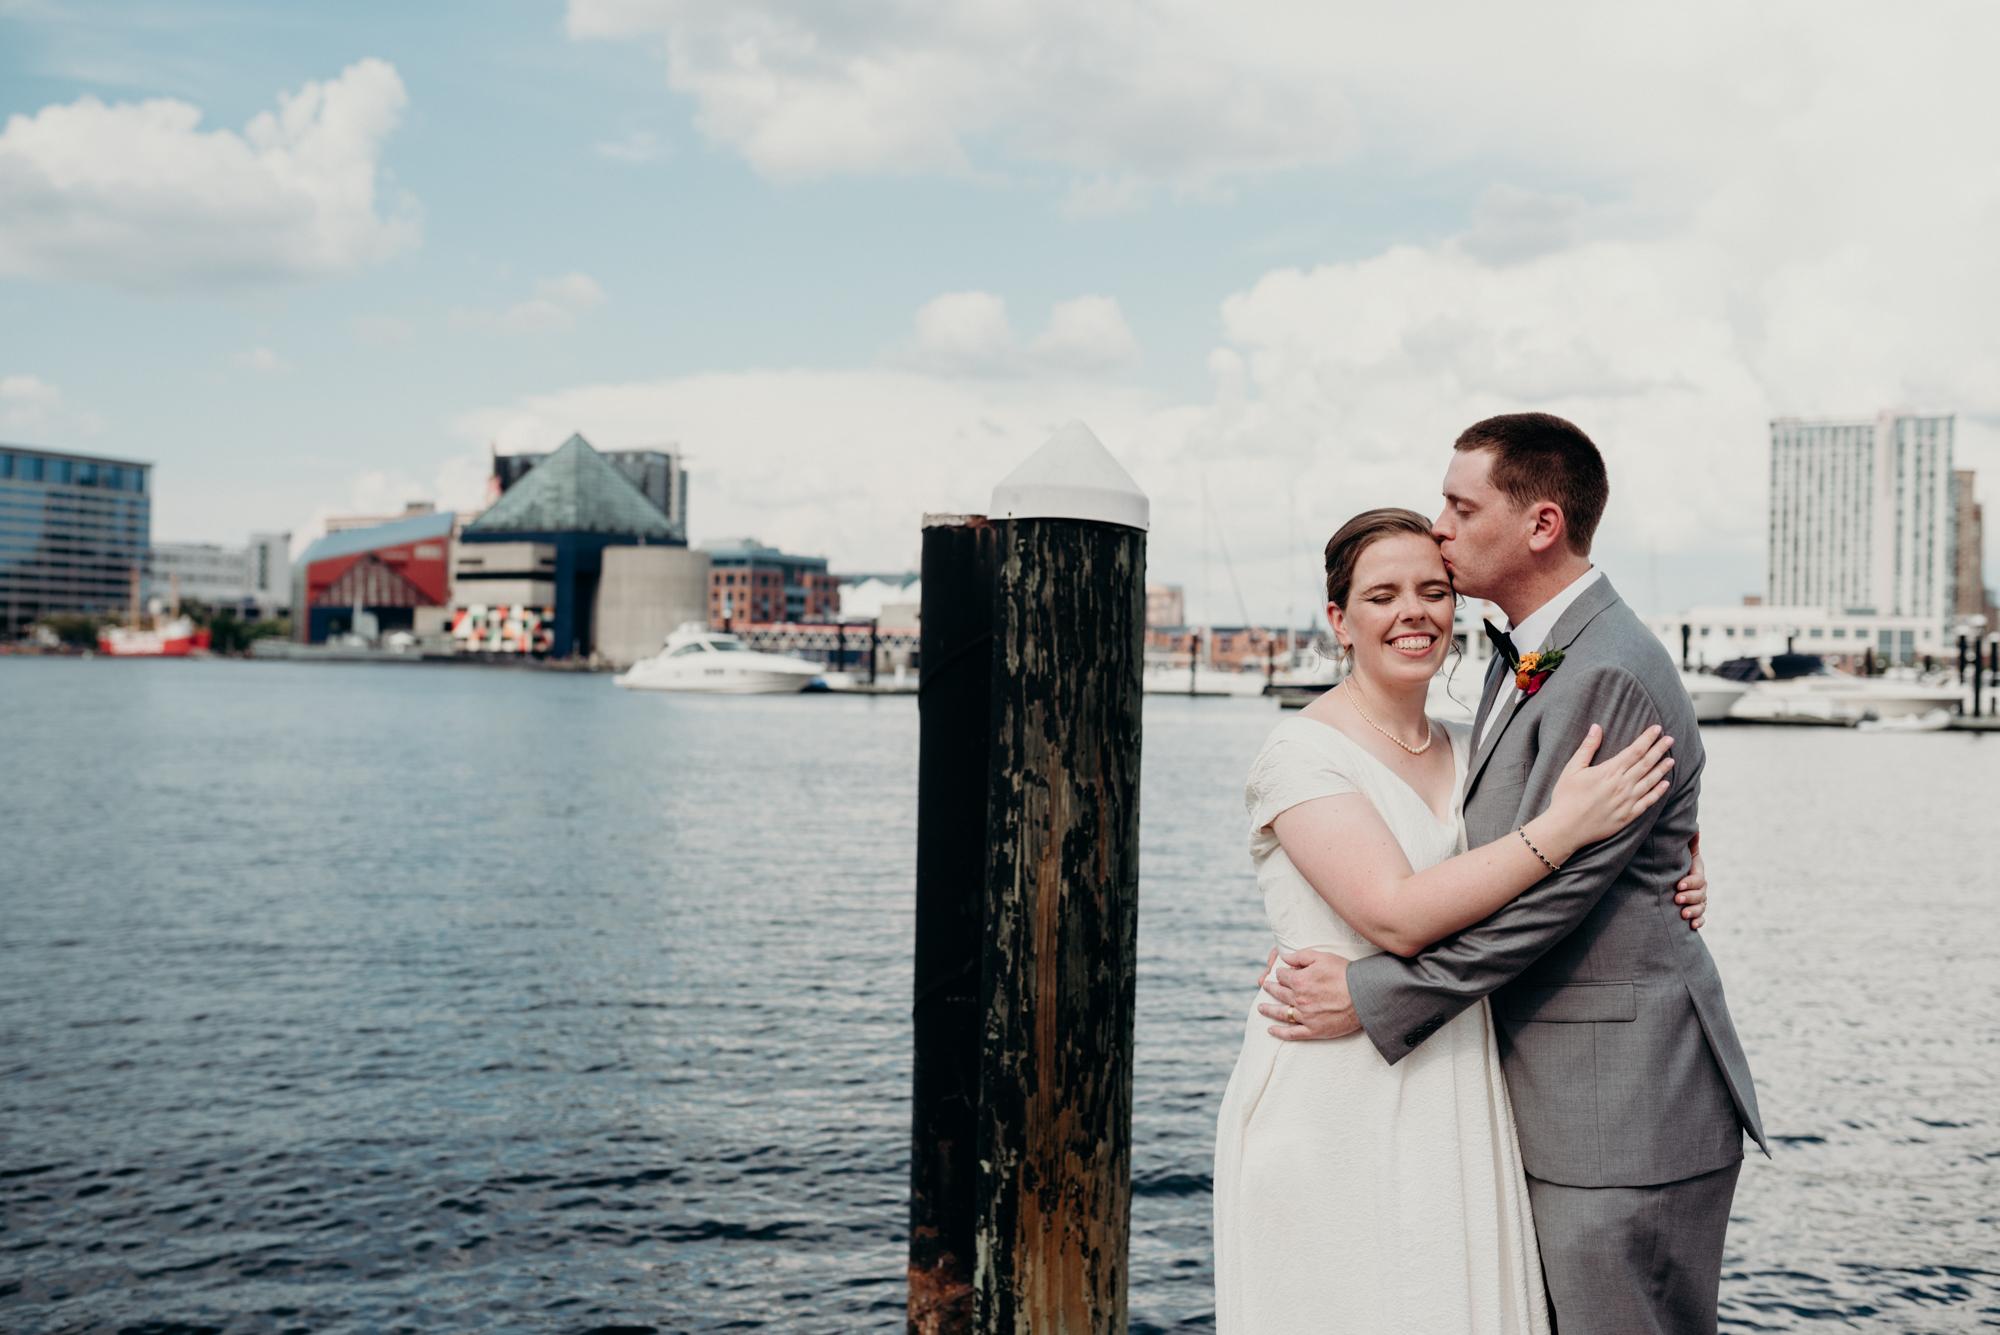 catholic-social-teaching-wedding-24.jpg